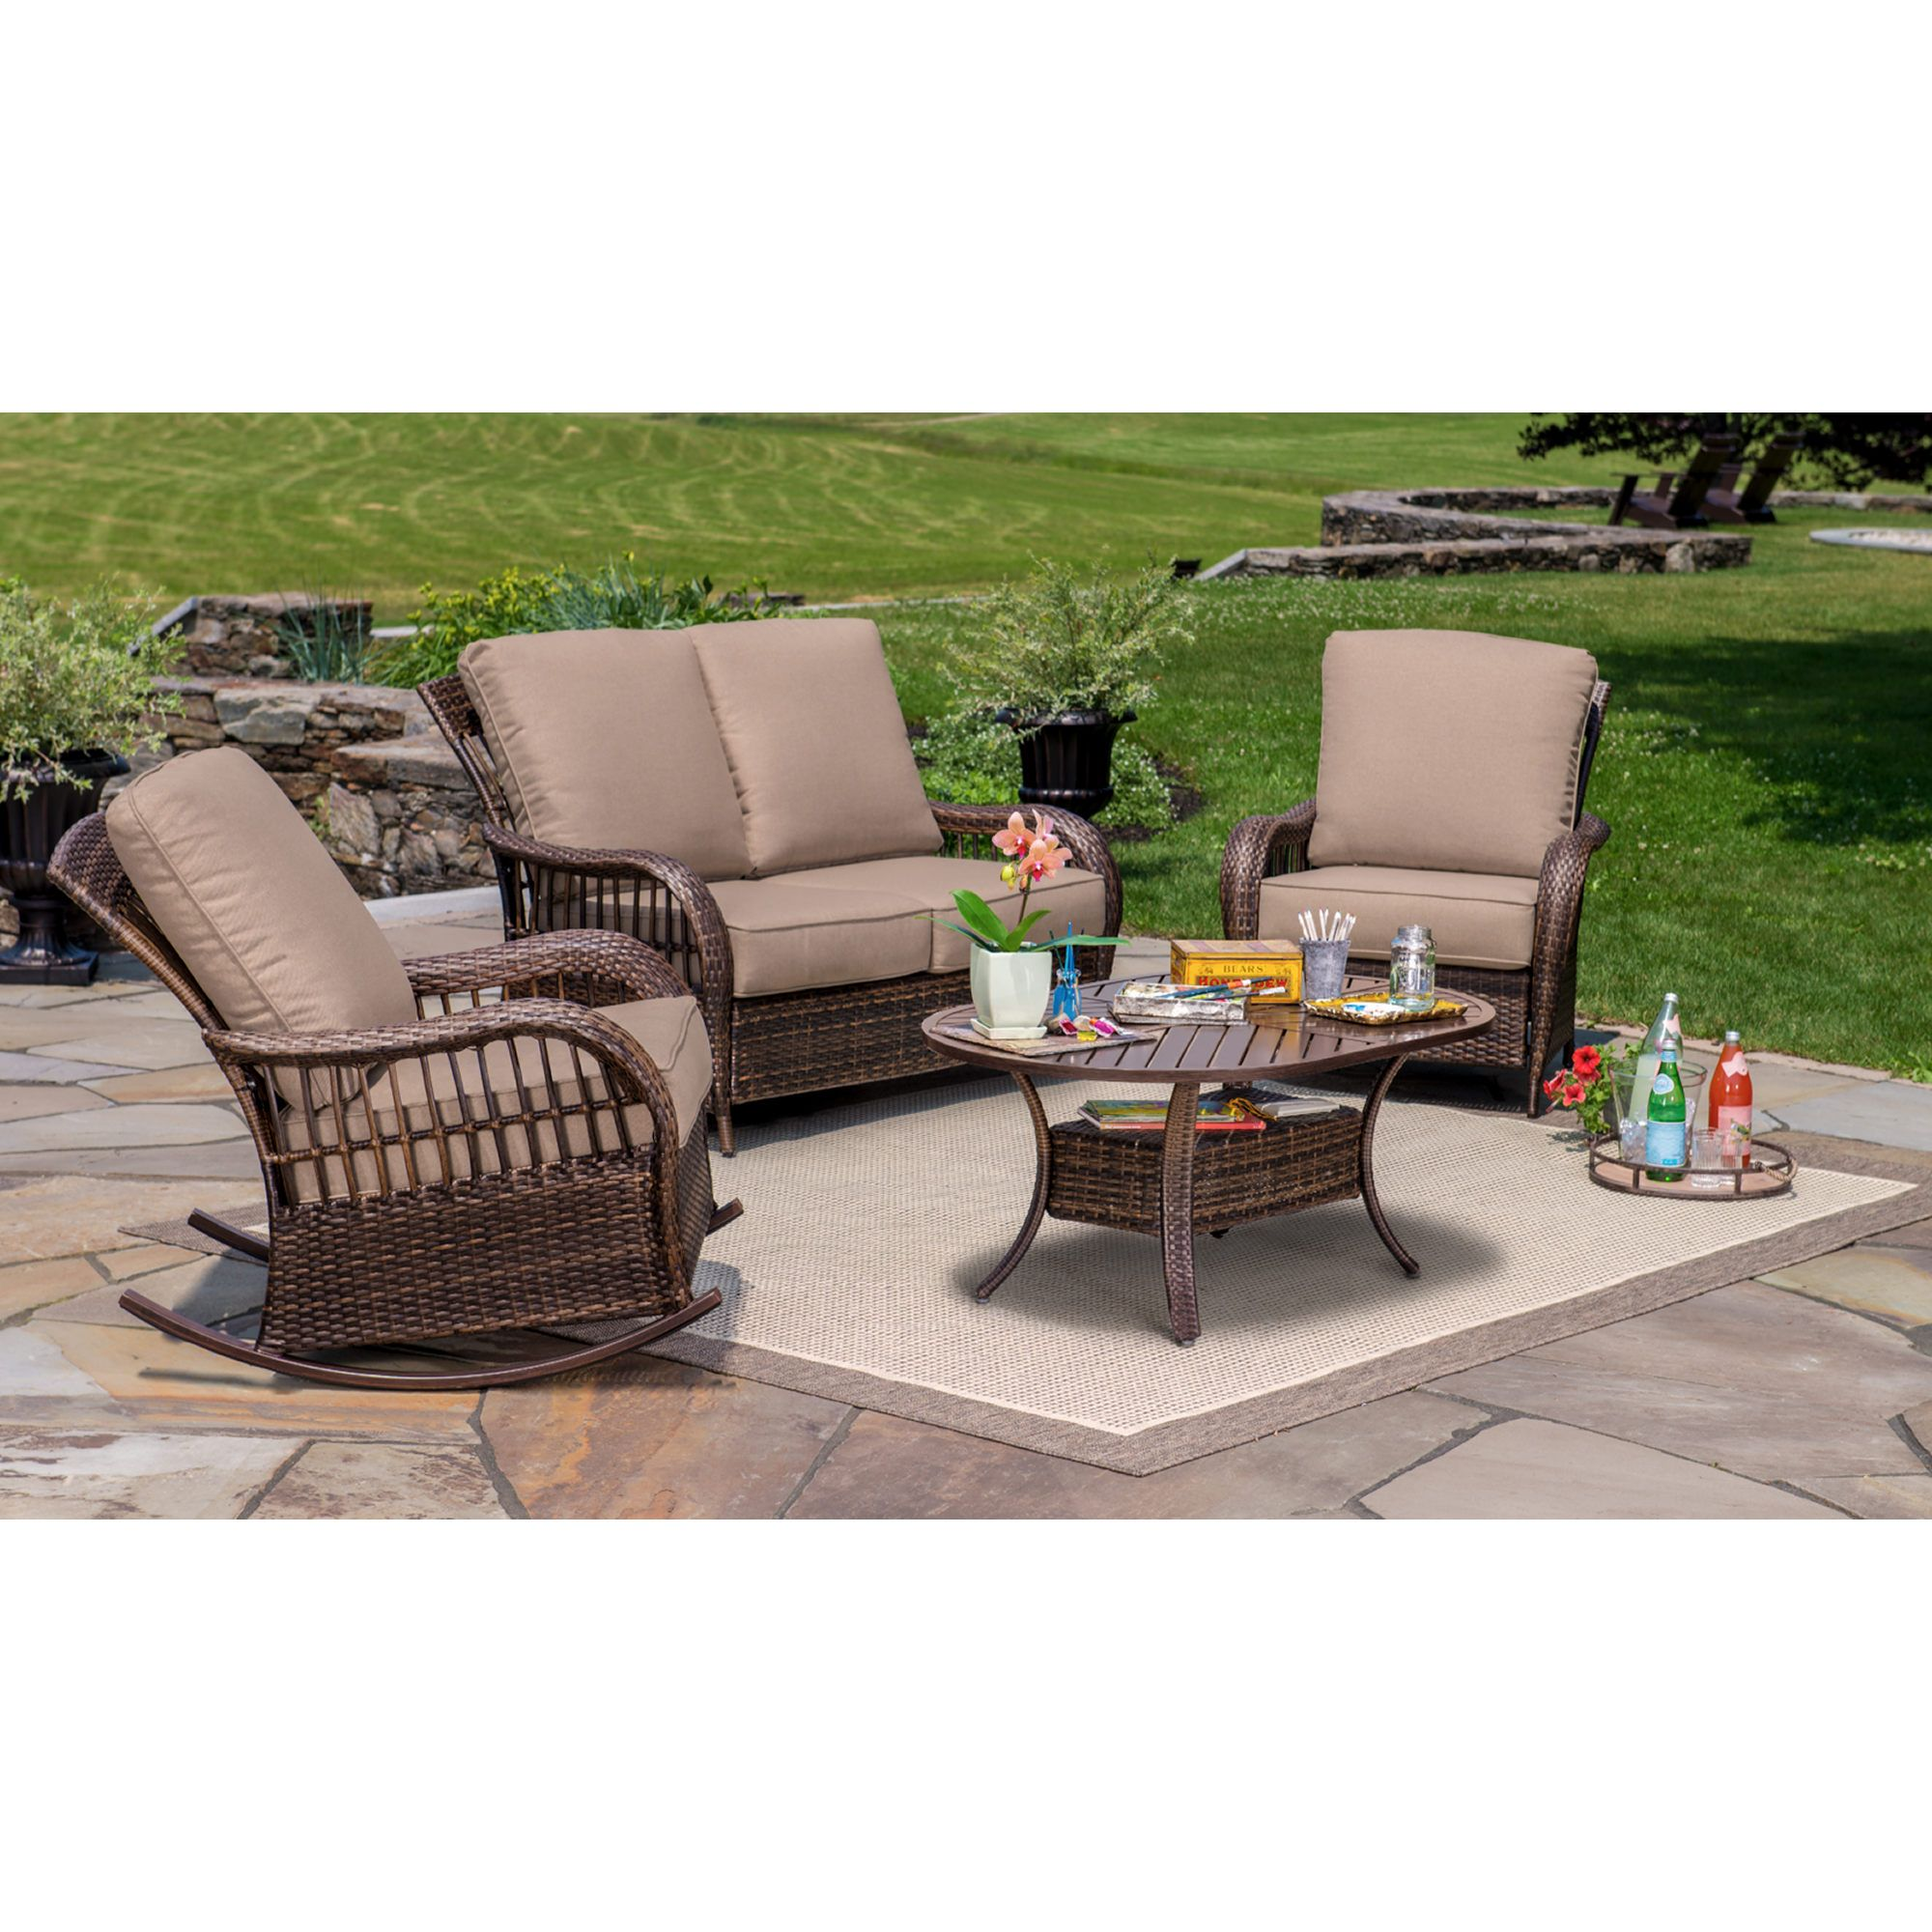 set pc club outdoor jensen berkley of patio calais pit wholesale best with fire furniture new bjs chat